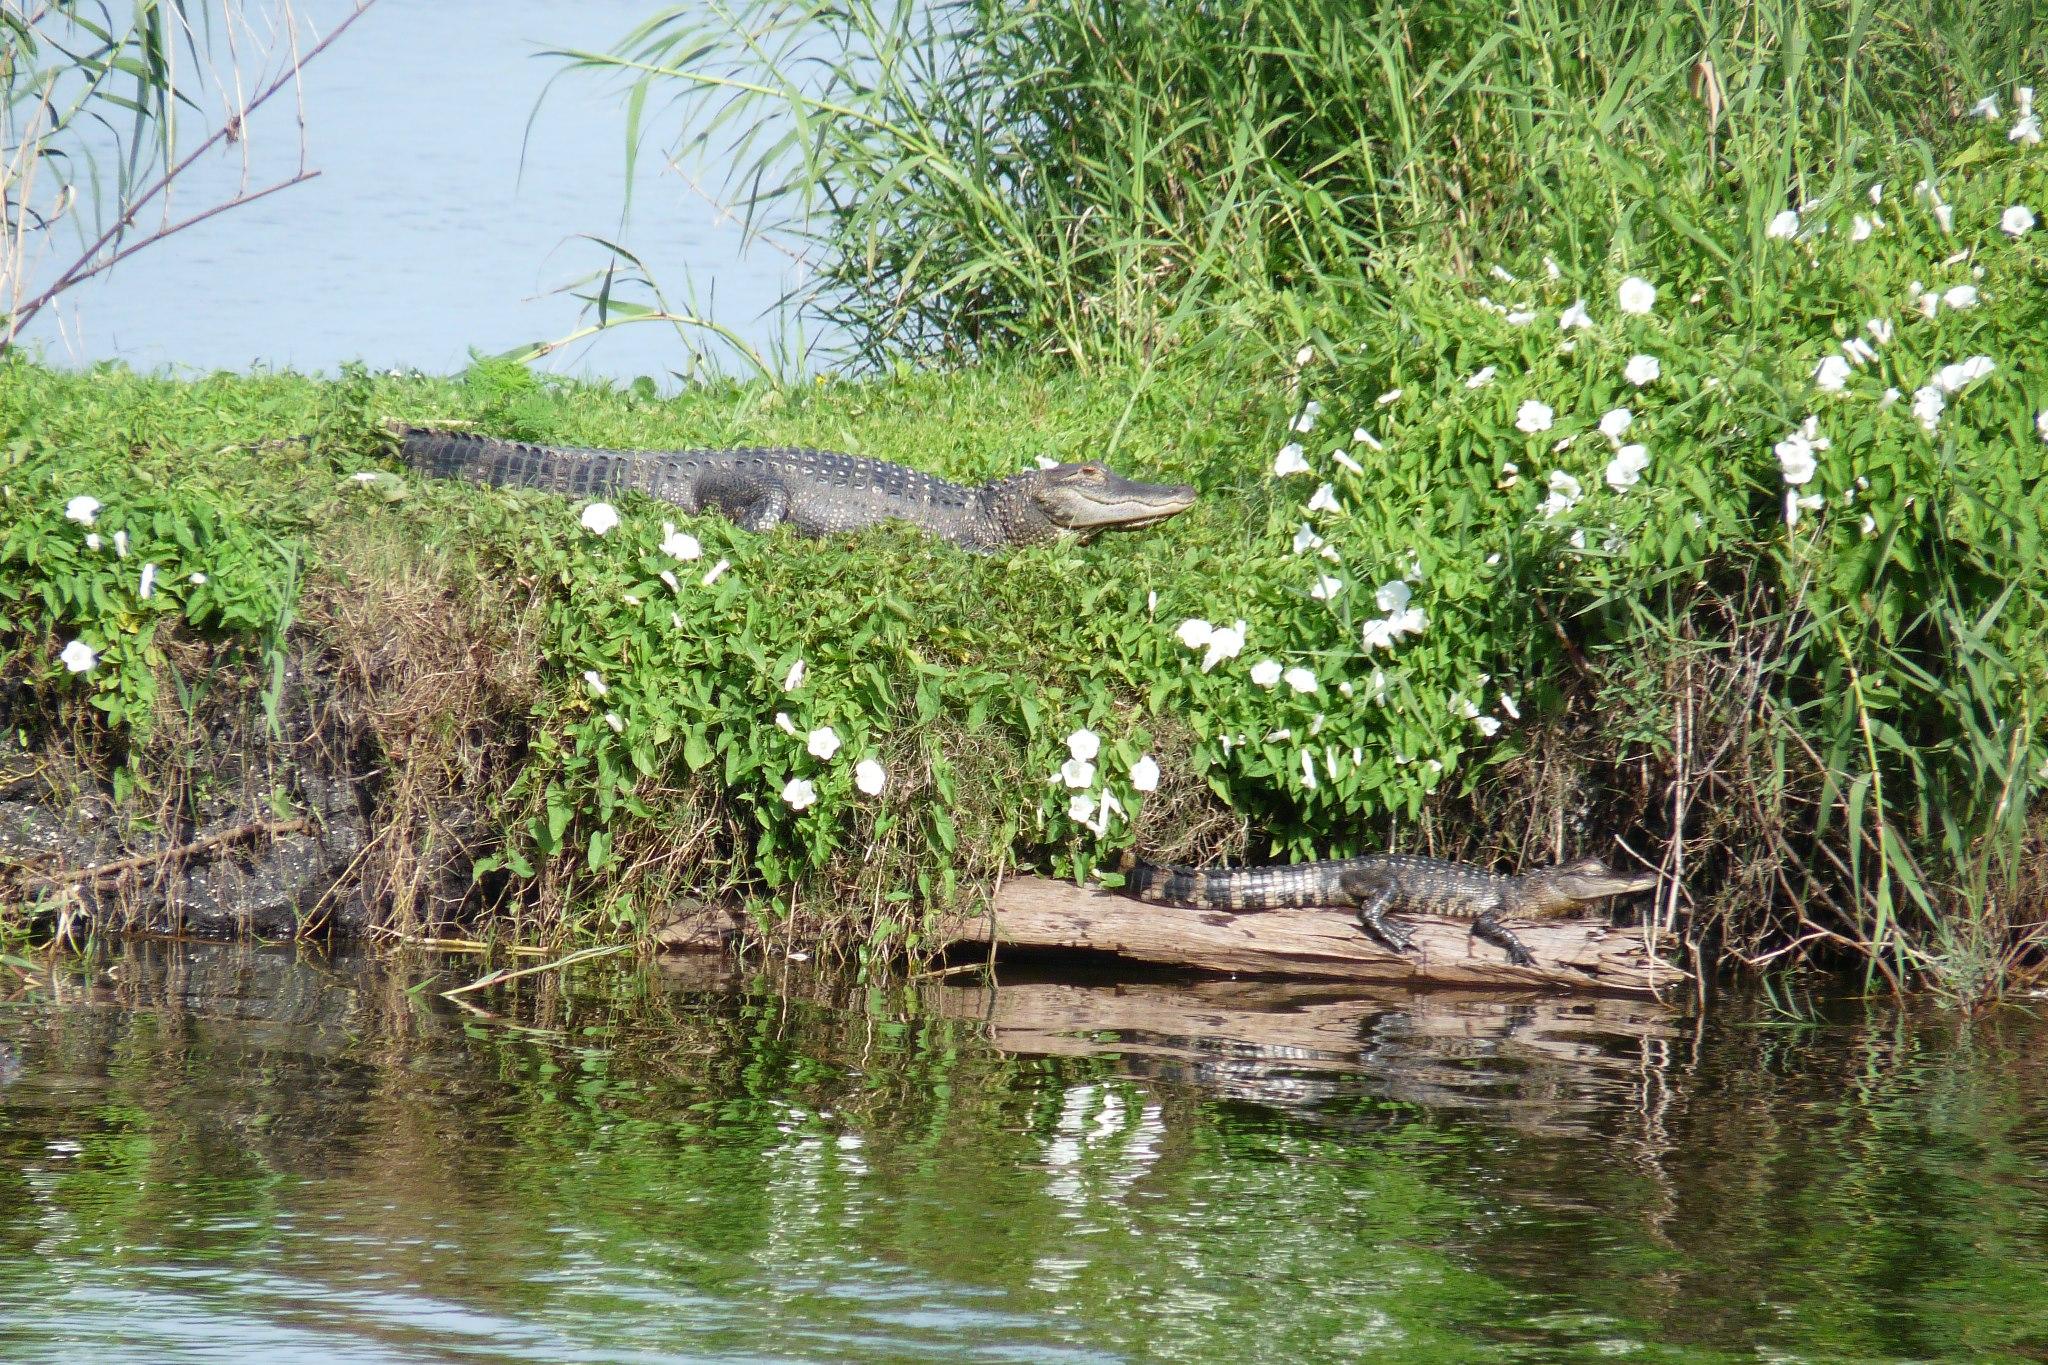 file alligators in lake jesup oviedo florida  jpg file alligators in lake jesup oviedo florida  jpg   wikimedia      rh    mons wikimedia org